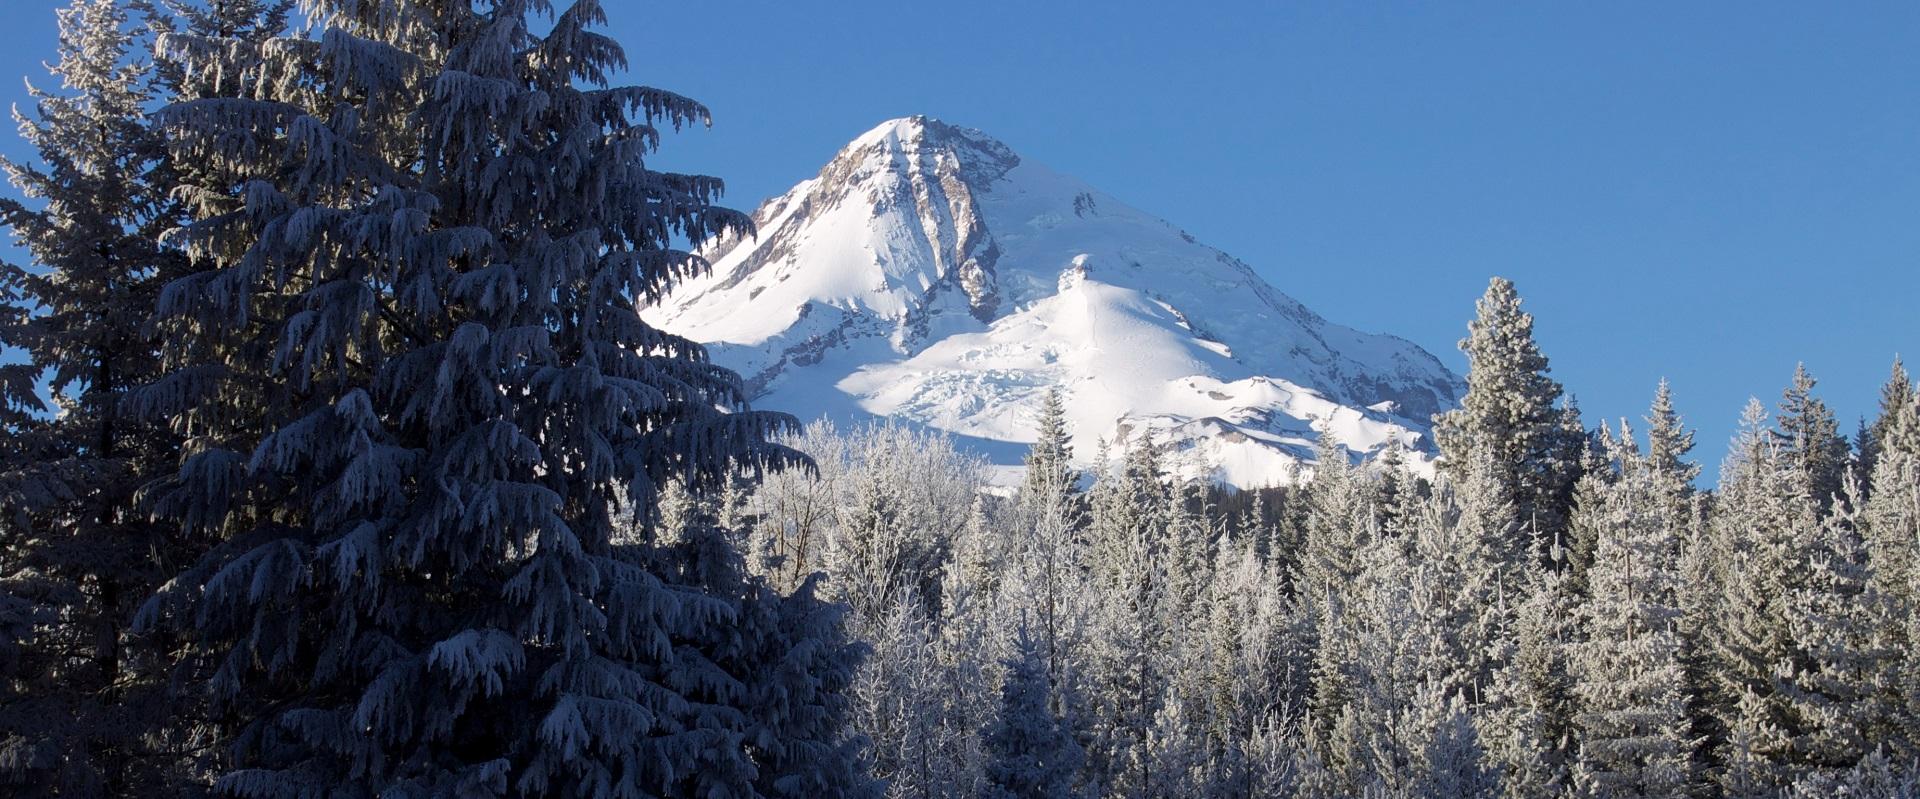 Mt. hood Outdoors